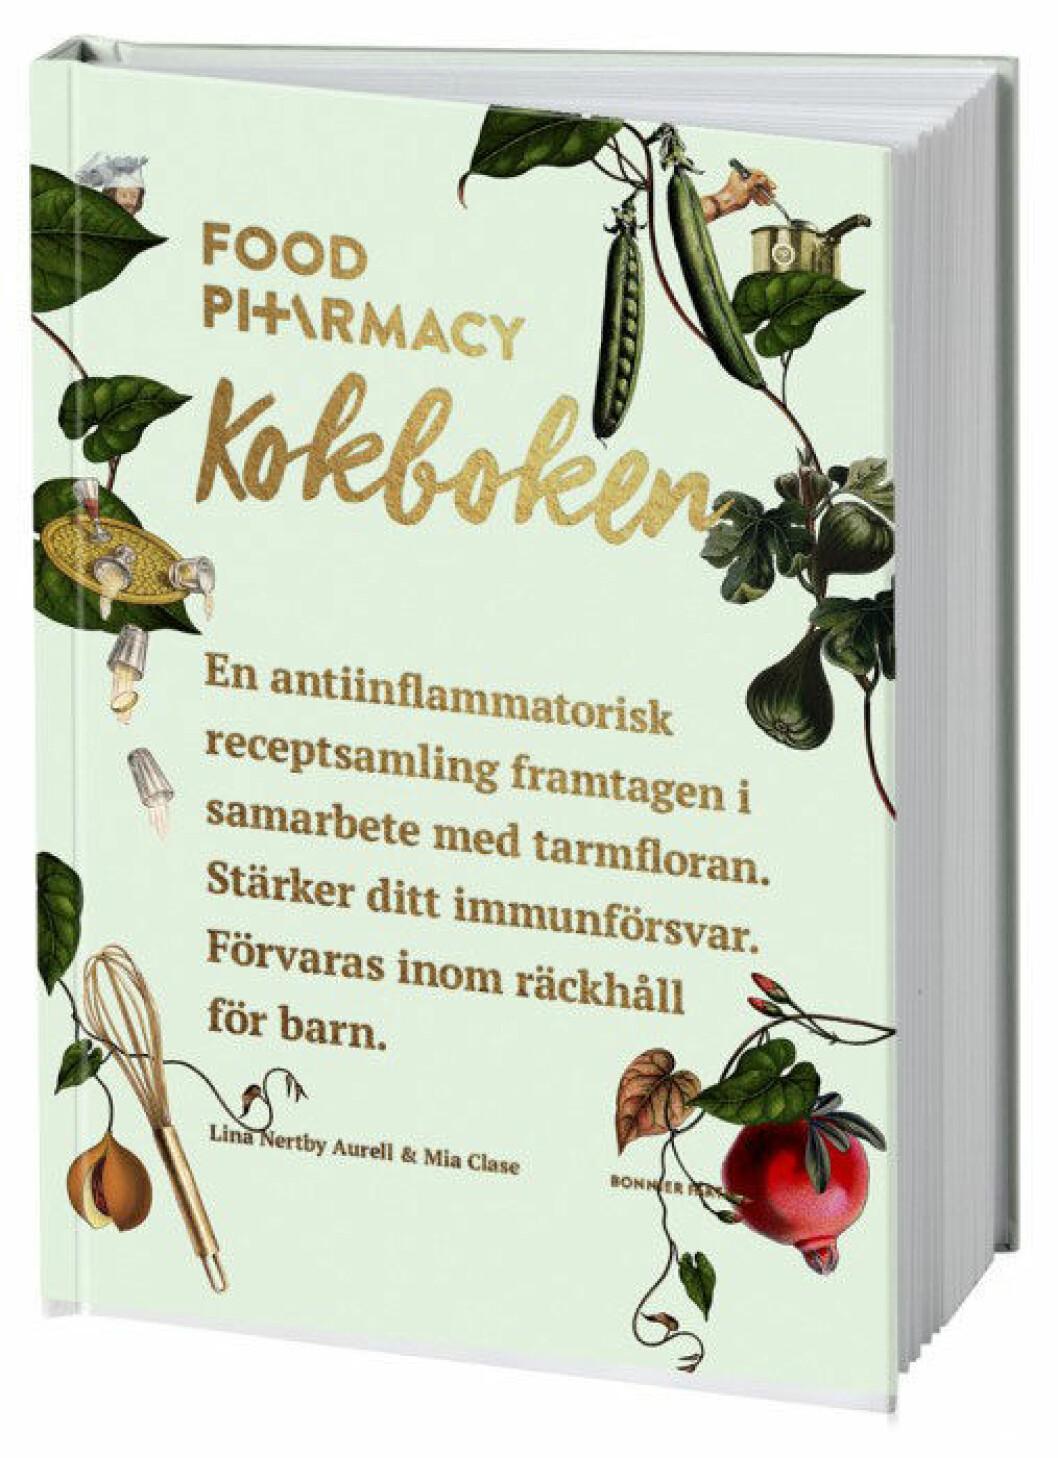 Food Pharmacy – kokboken, Mia Clase, Lina Nertby Aurell